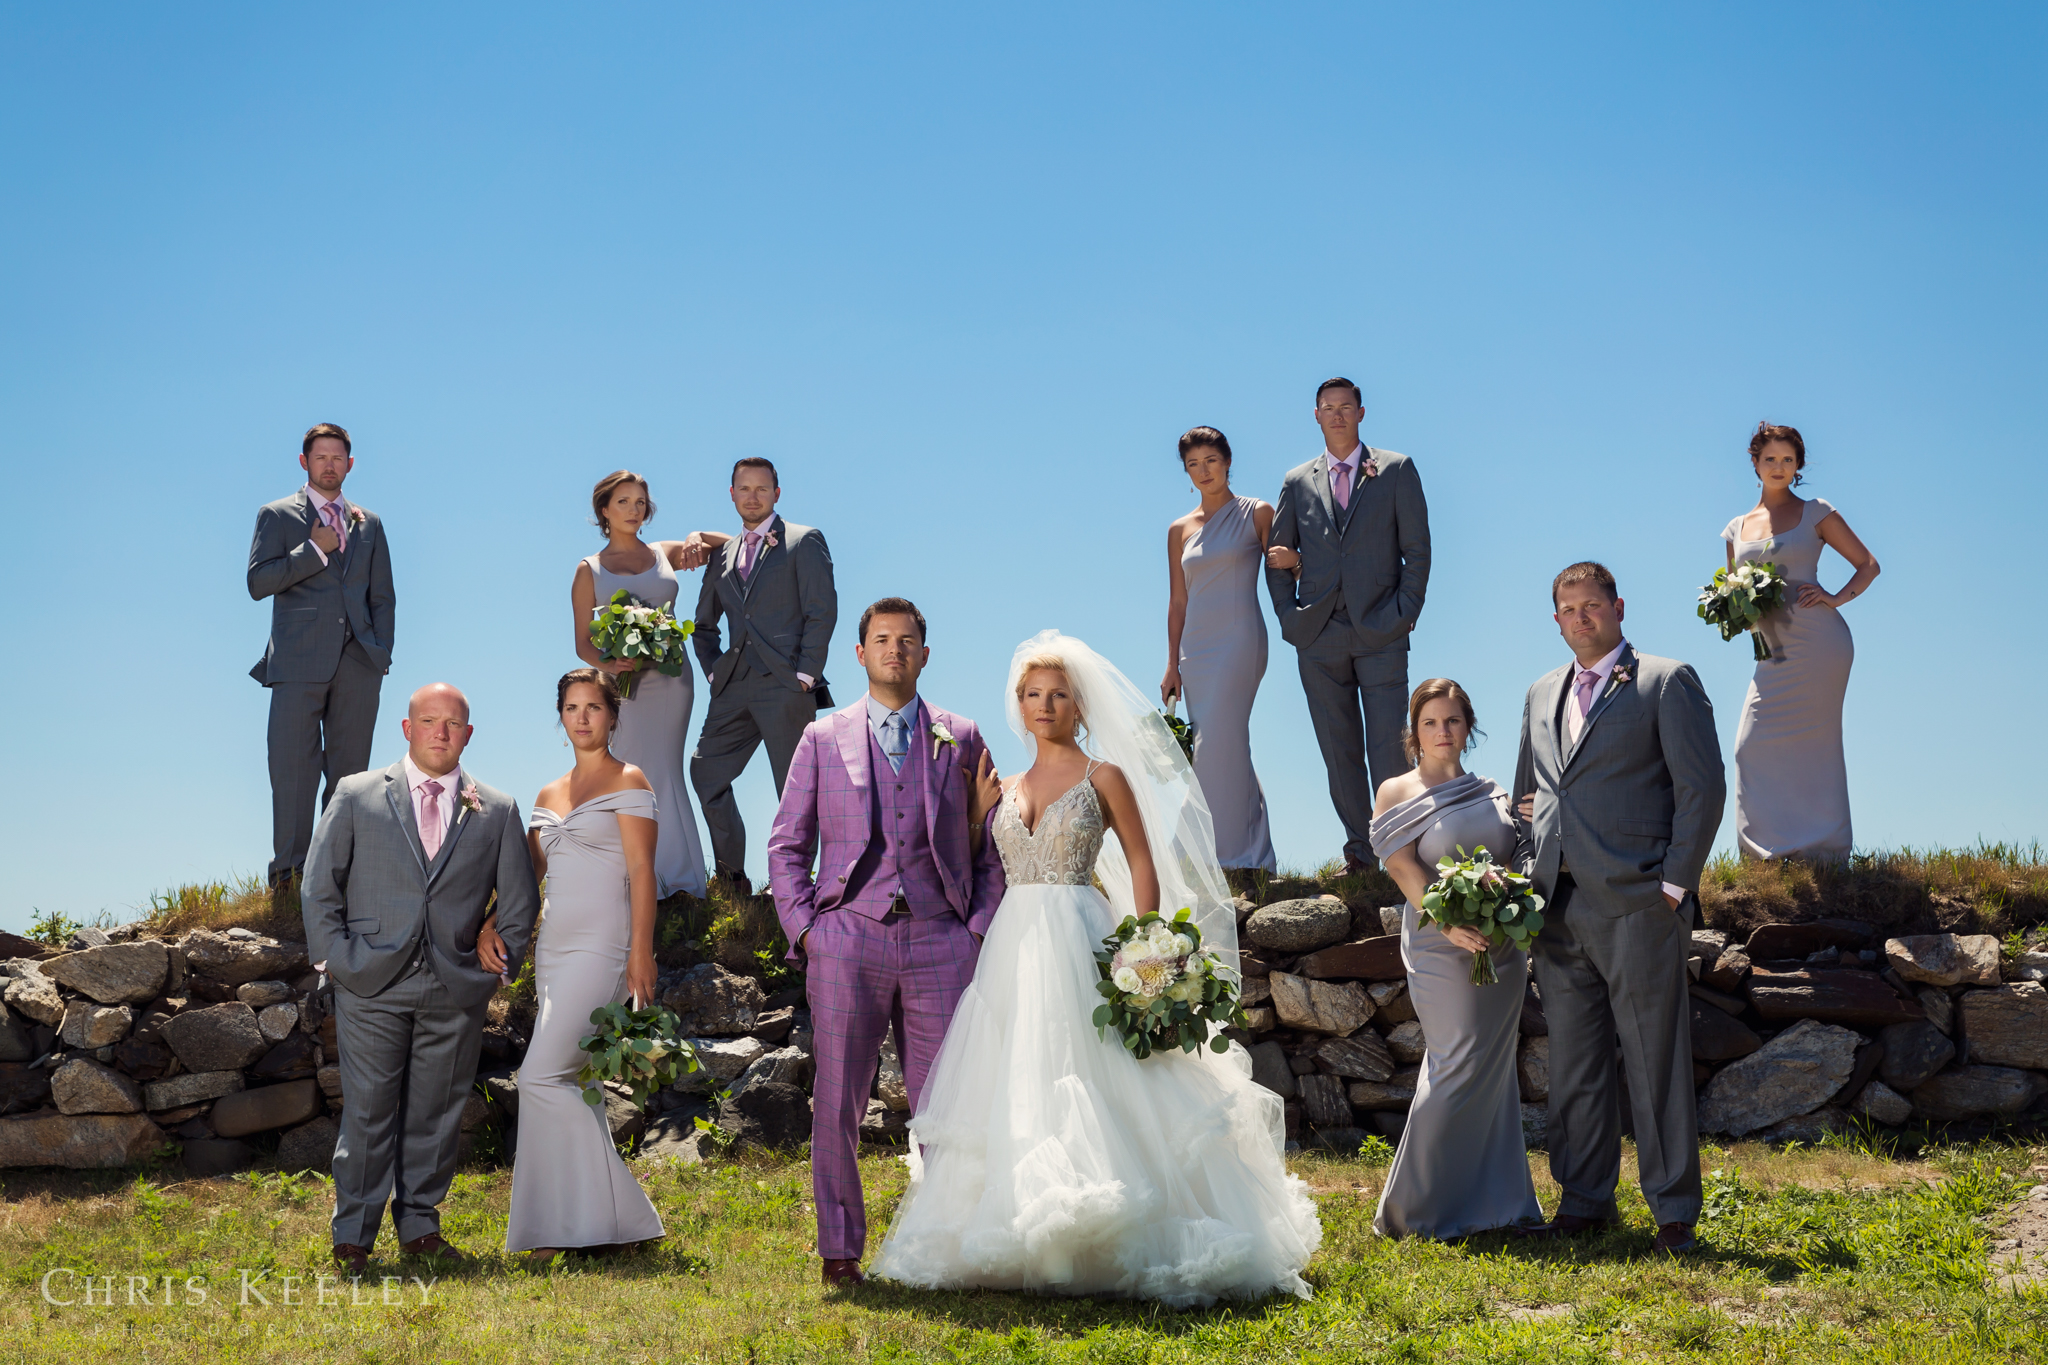 wentworth-portsmouth-new-hampshire-wedding-photographer-41.jpg